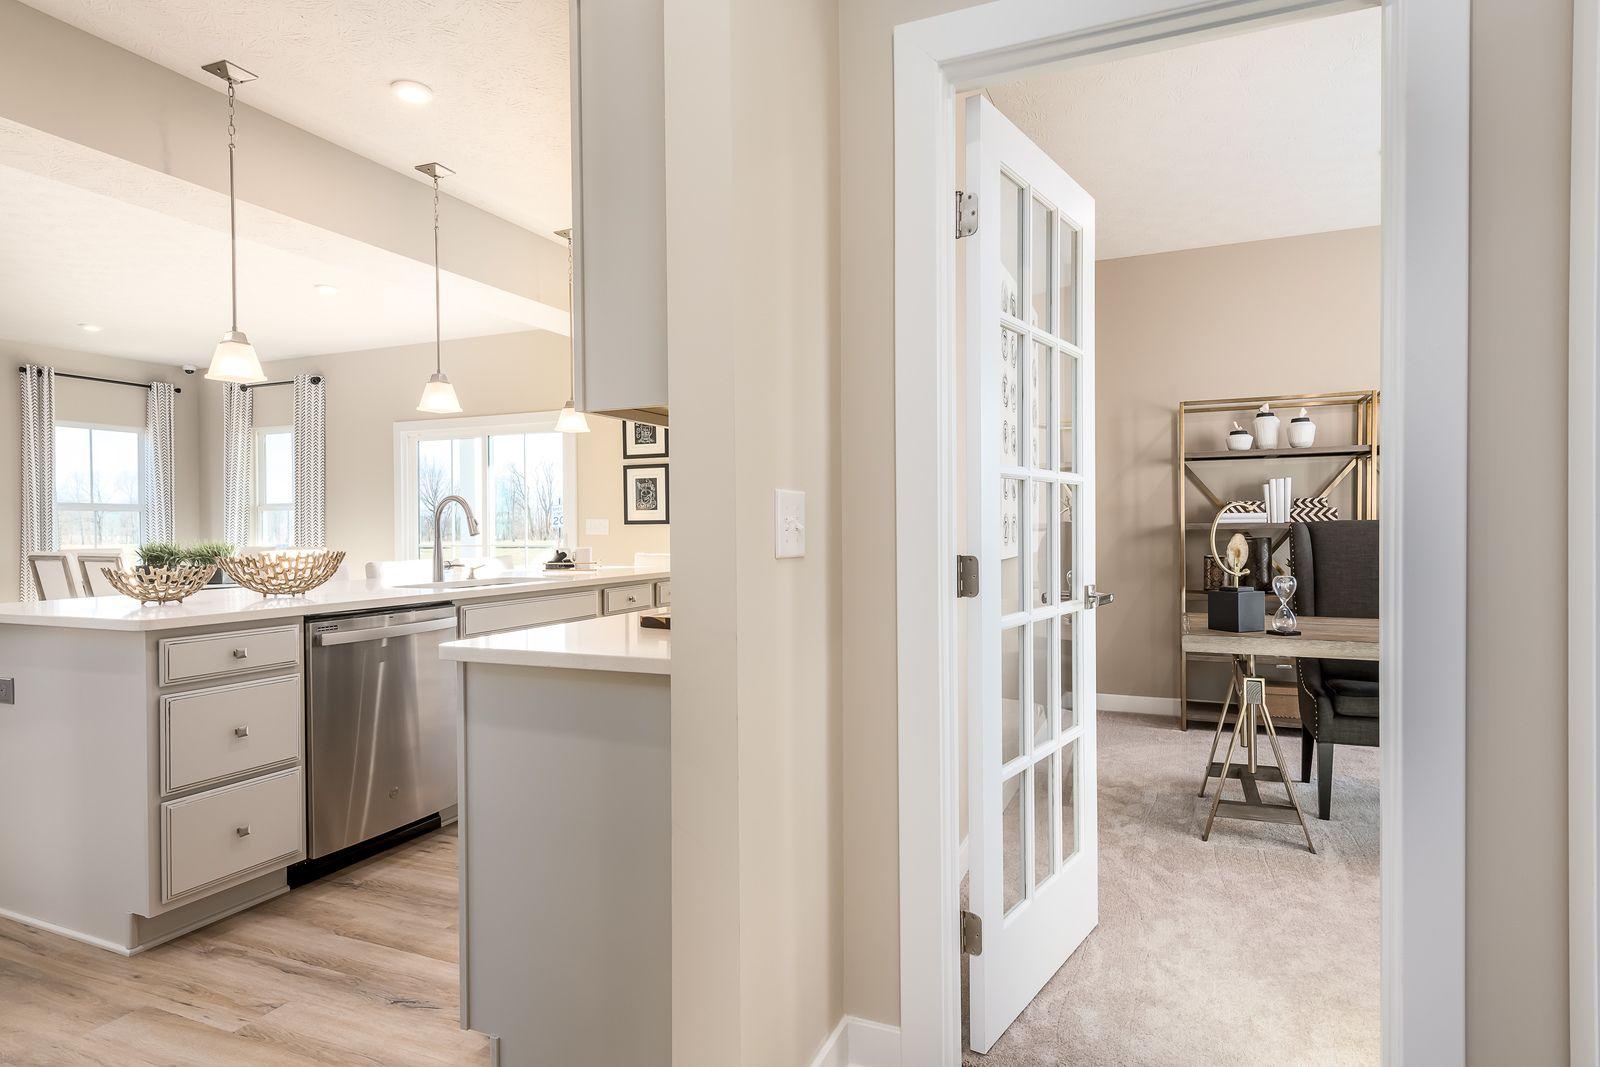 Kitchen featured in the Hudson By Ryan Homes in Nashville, TN